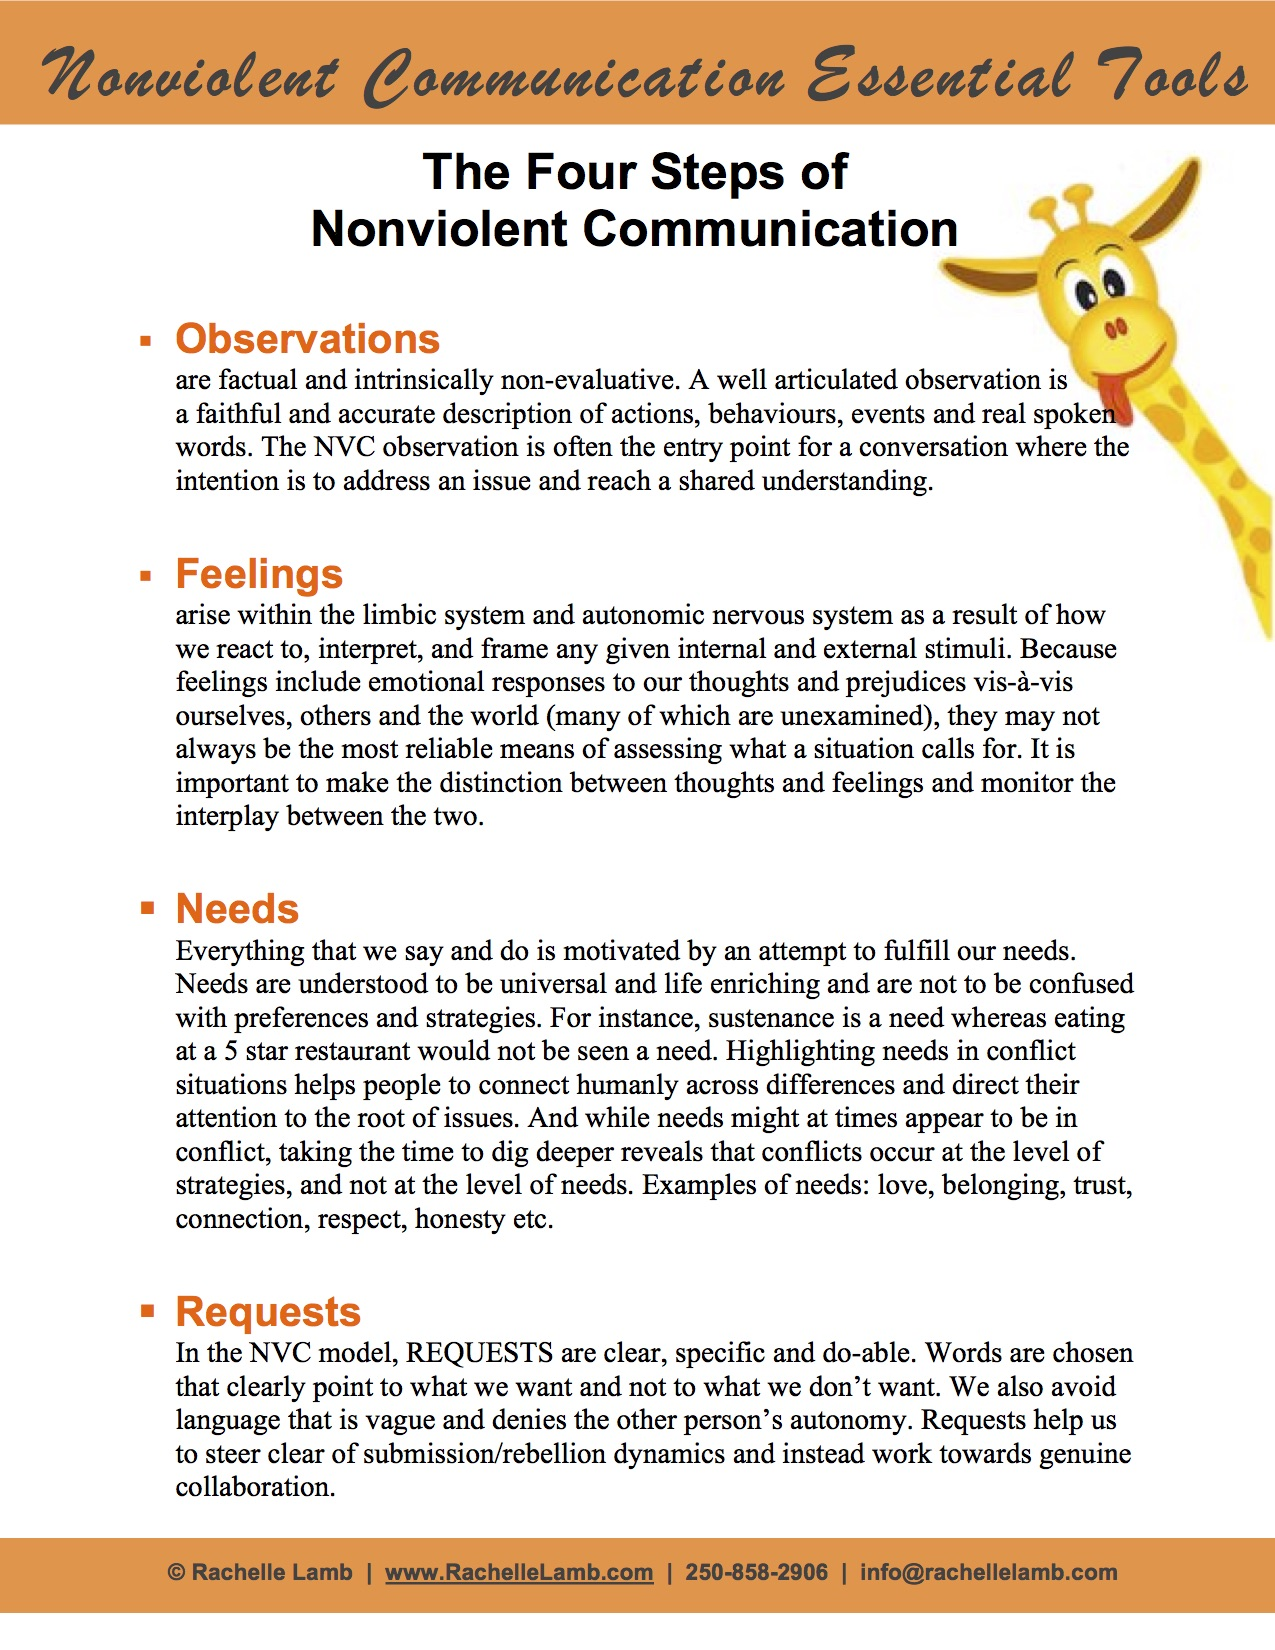 Nonviolent Communication Tools OFNR